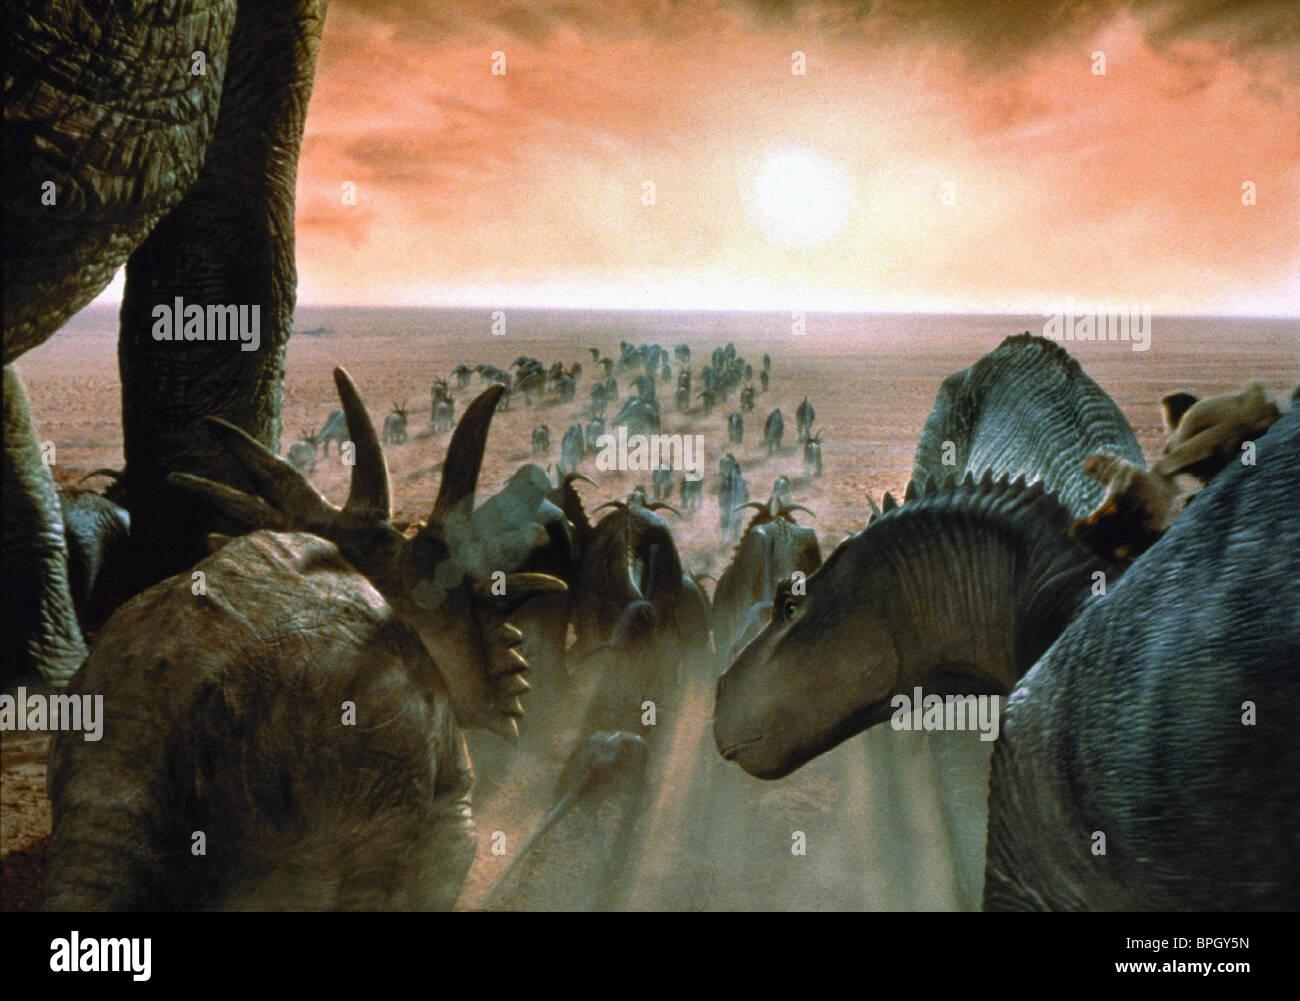 Aladar Eema Dinosaur 2000 Stock Photo Alamy